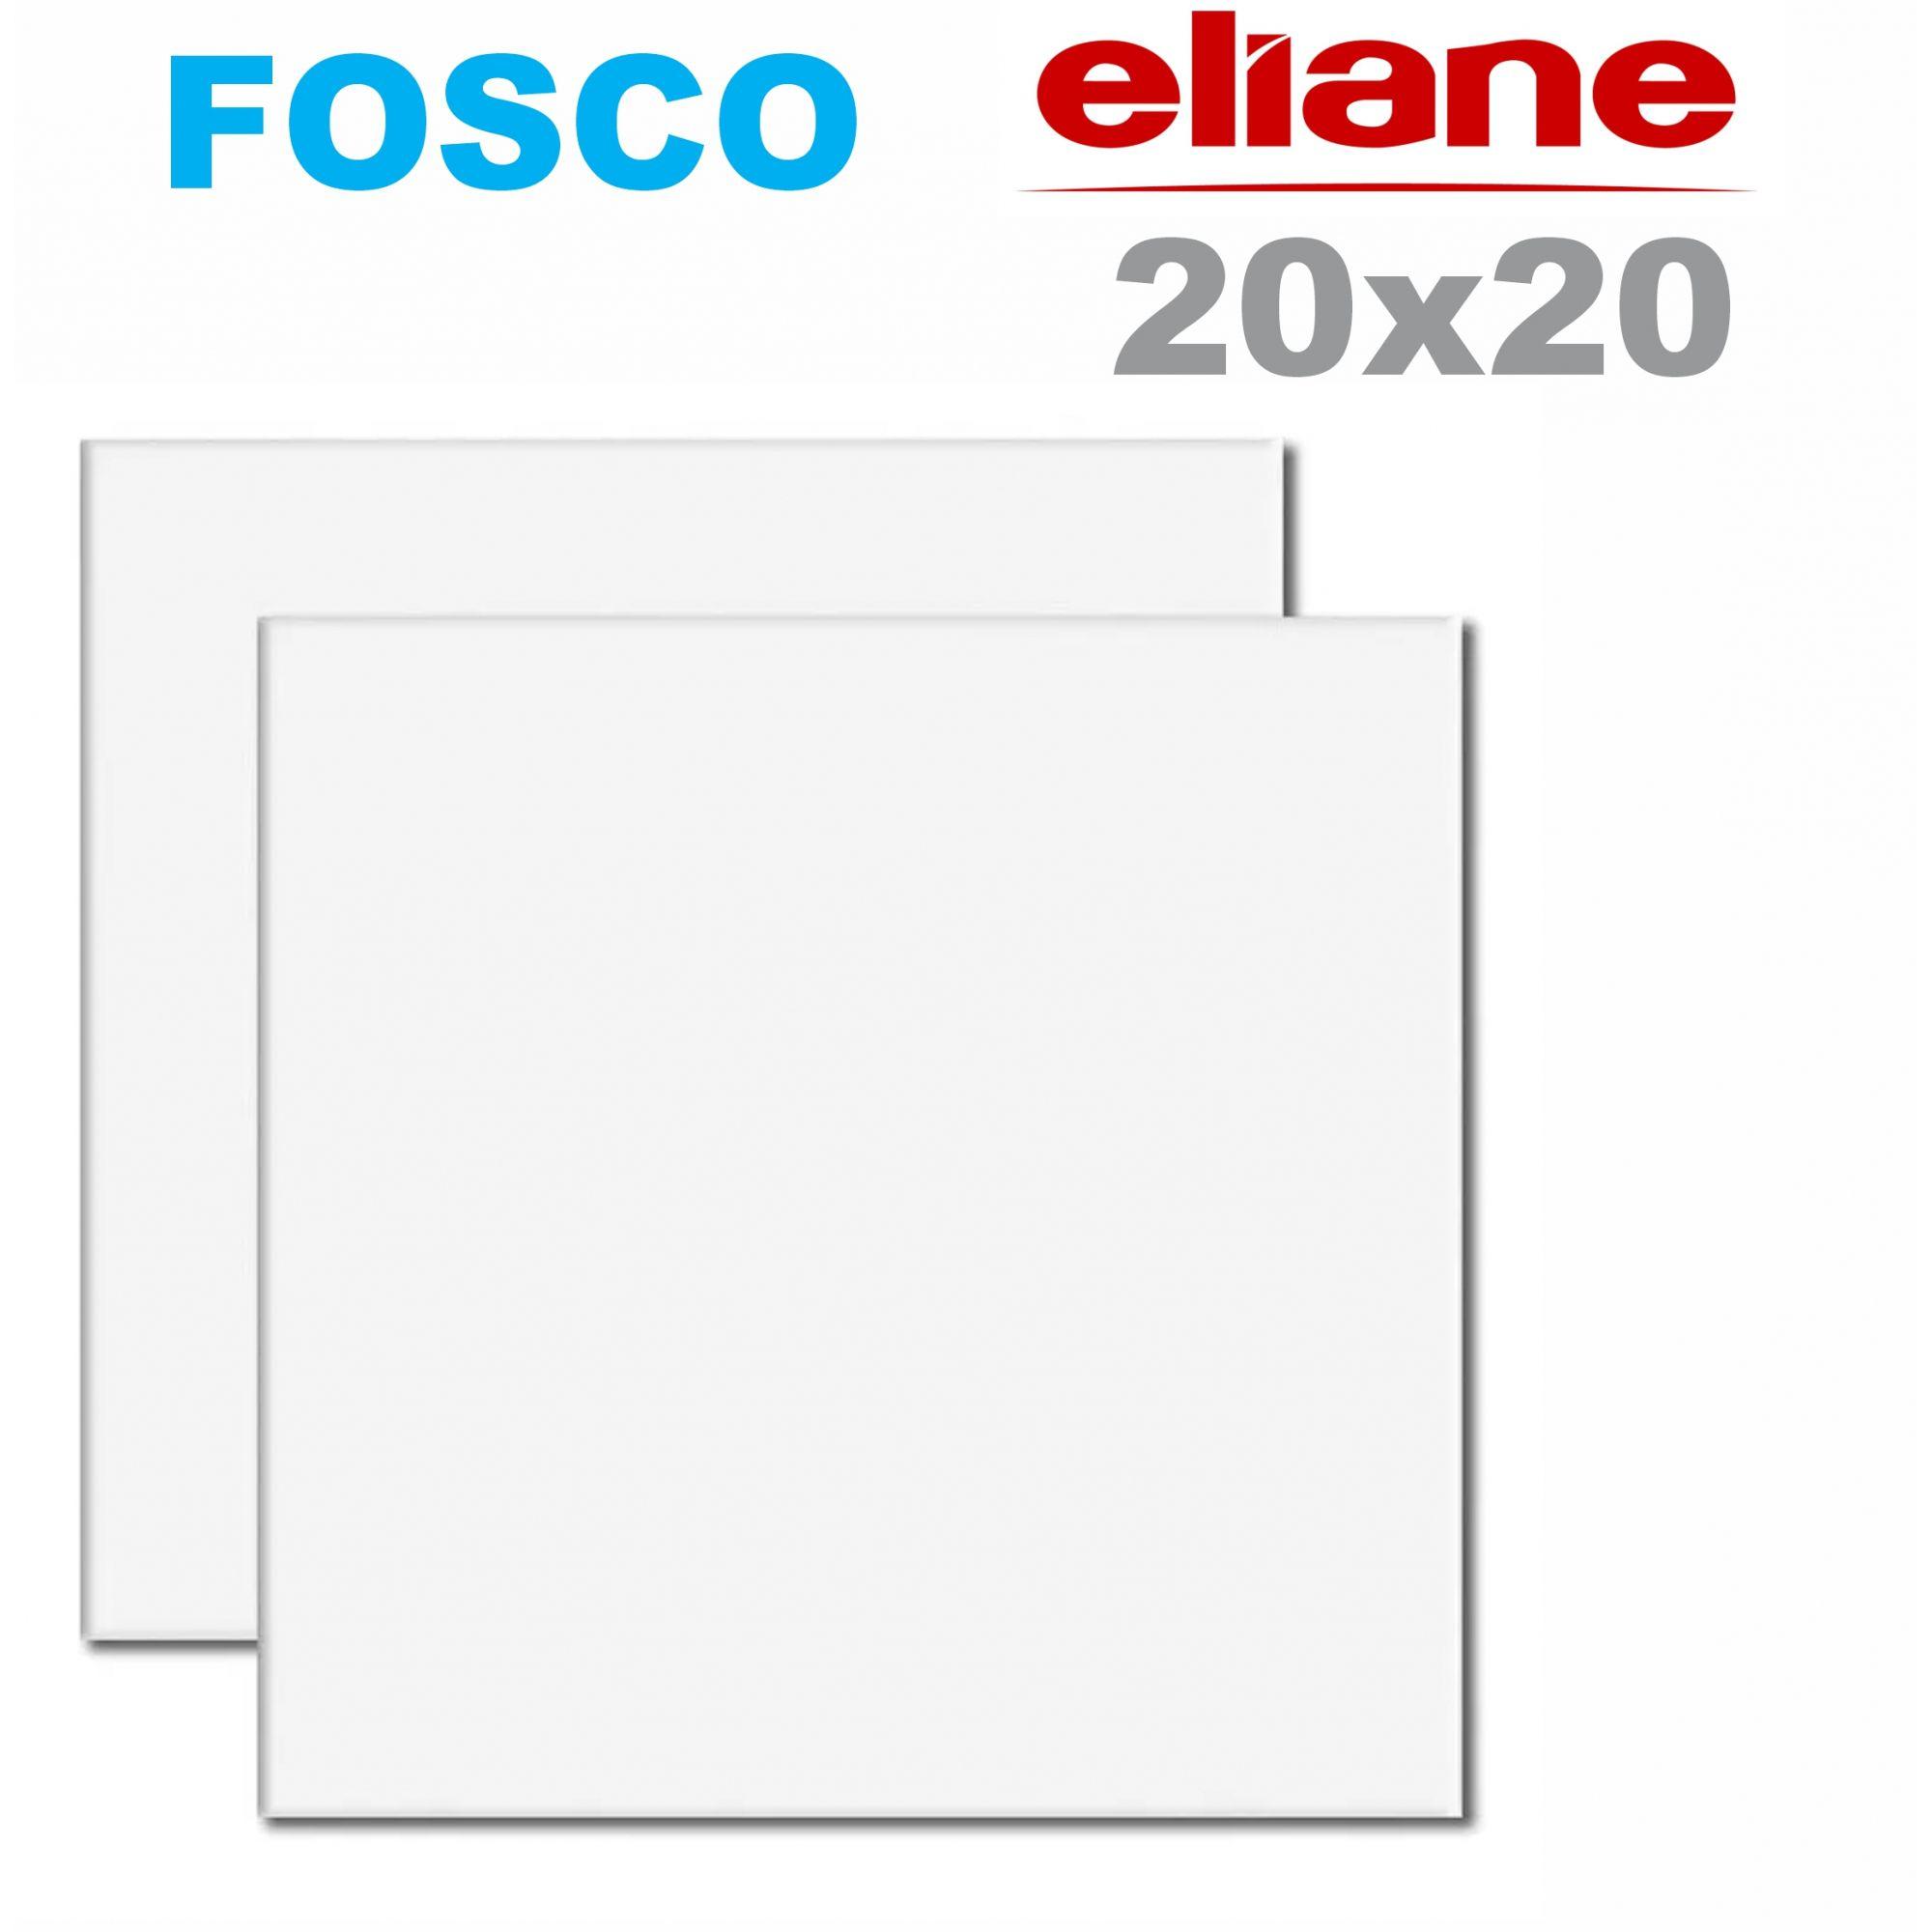 Azulejo Fosco 20x20 10 Unidades